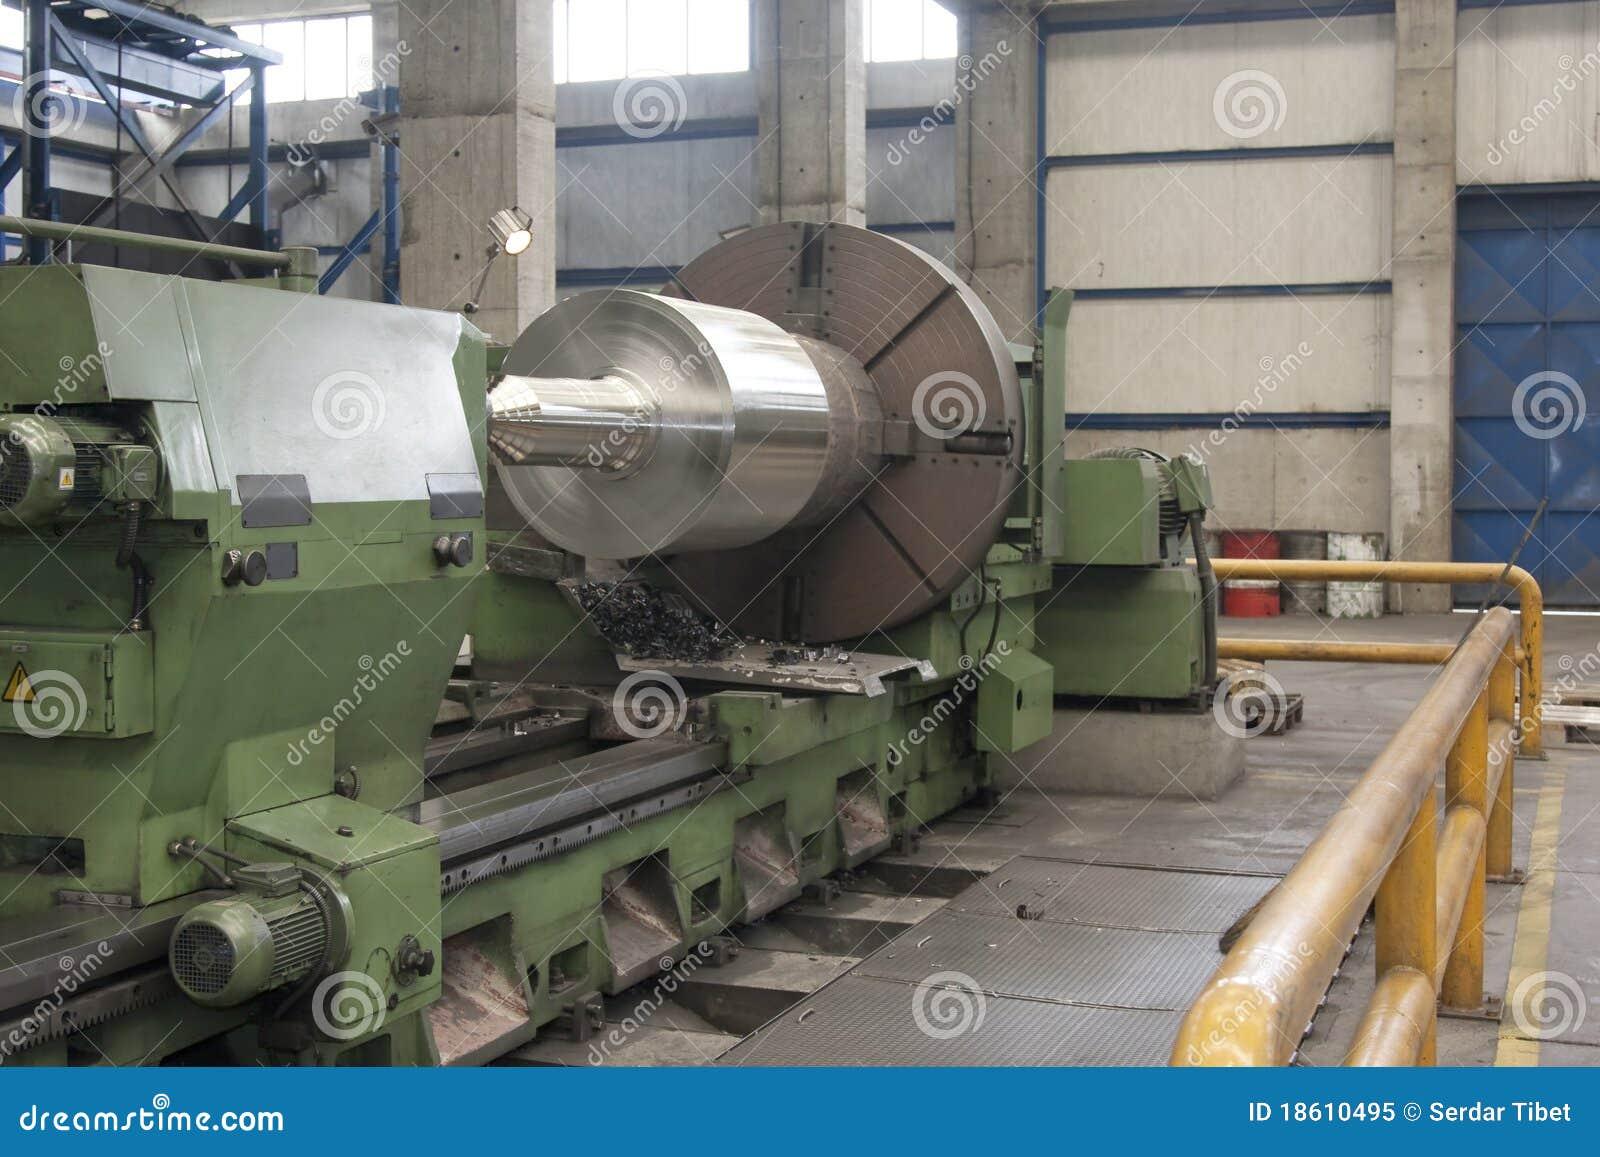 Lathe Grinder Stock Image Image Of Manufacturing